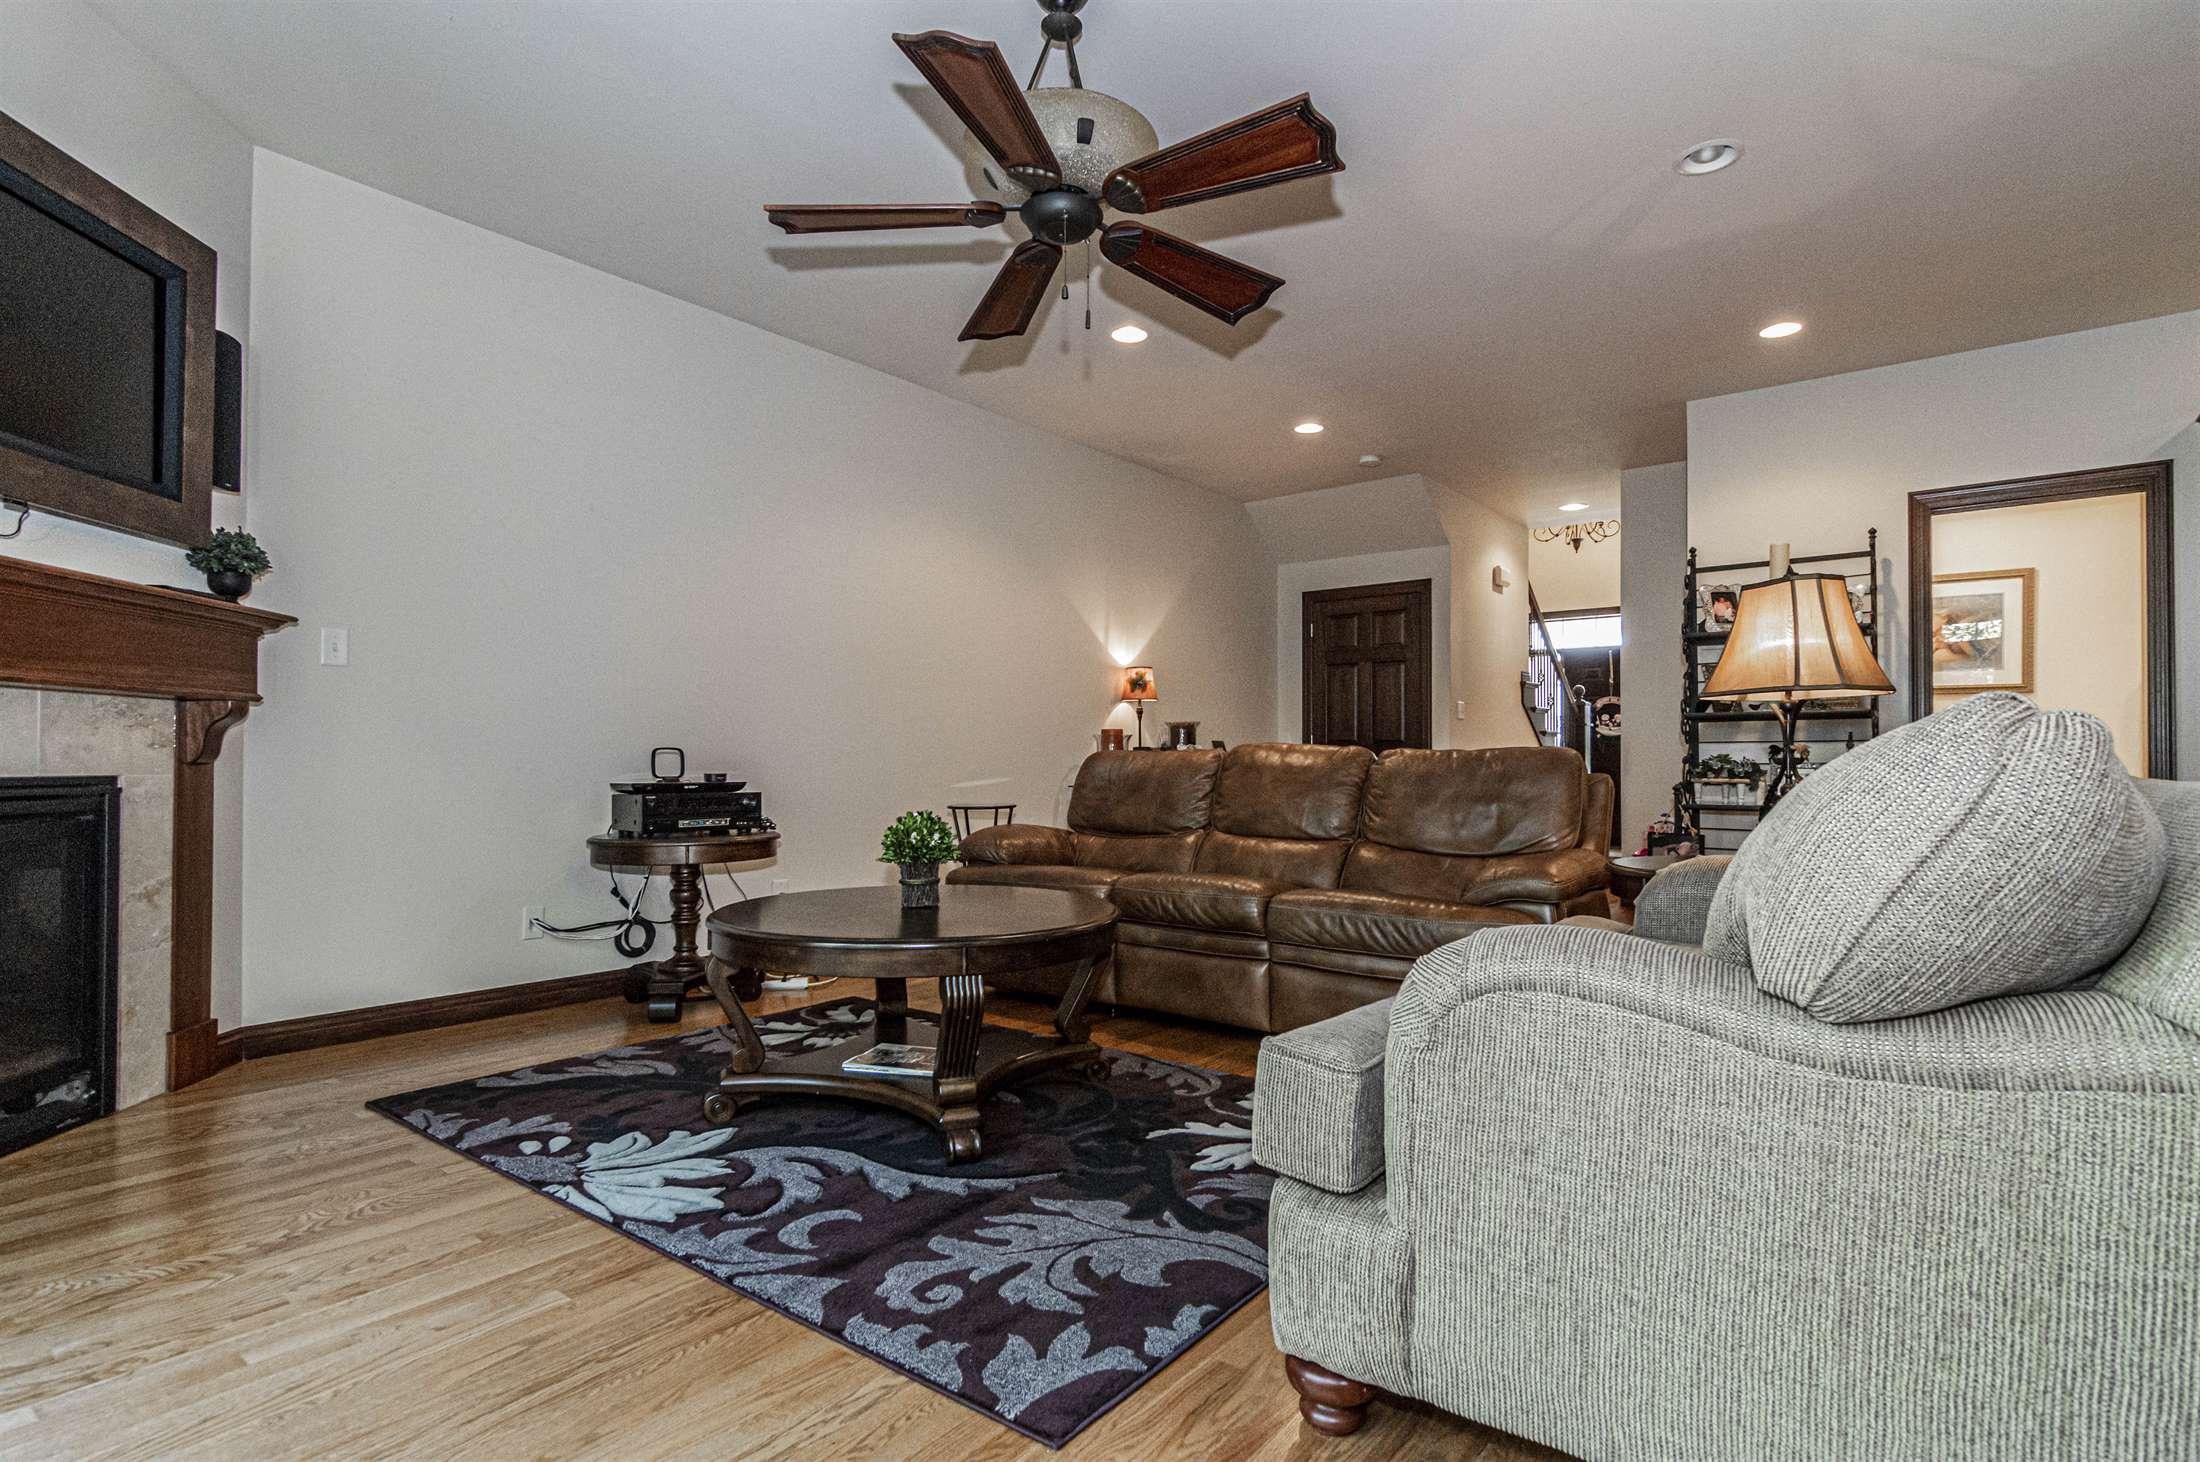 1400 Oaktree Place, Manhattan, KS 66503